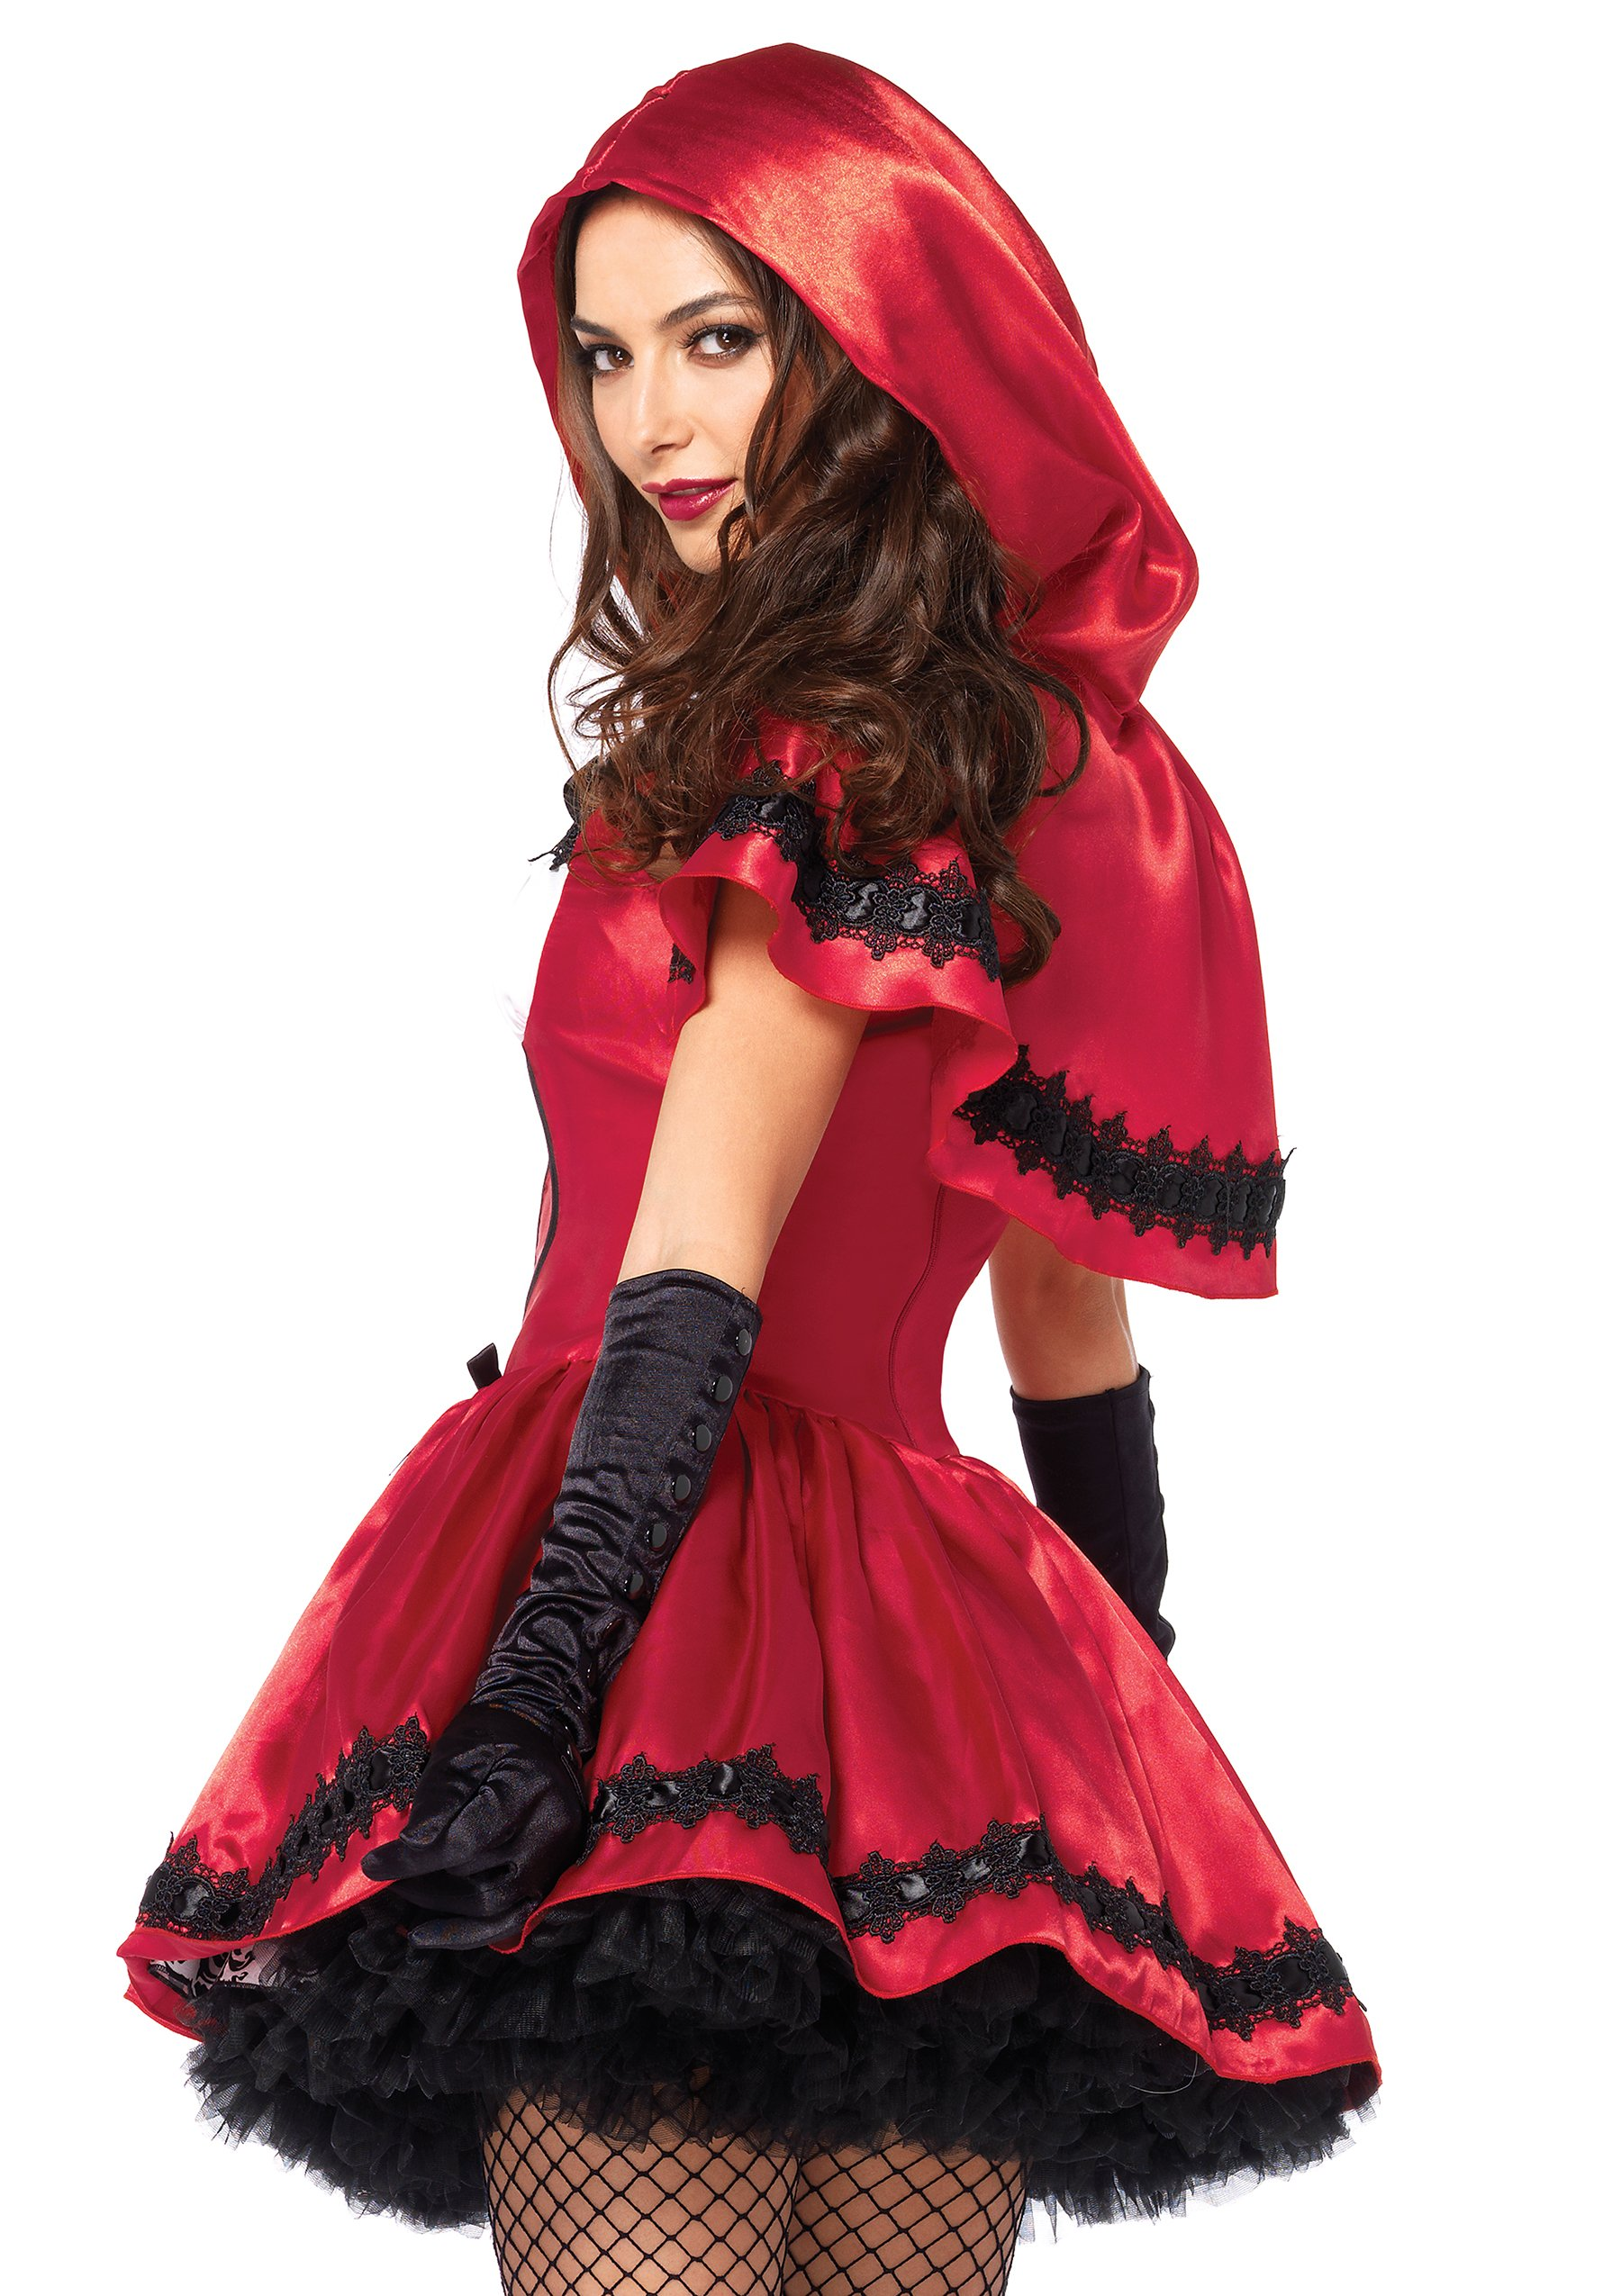 Red Riding Hood 2 Teil